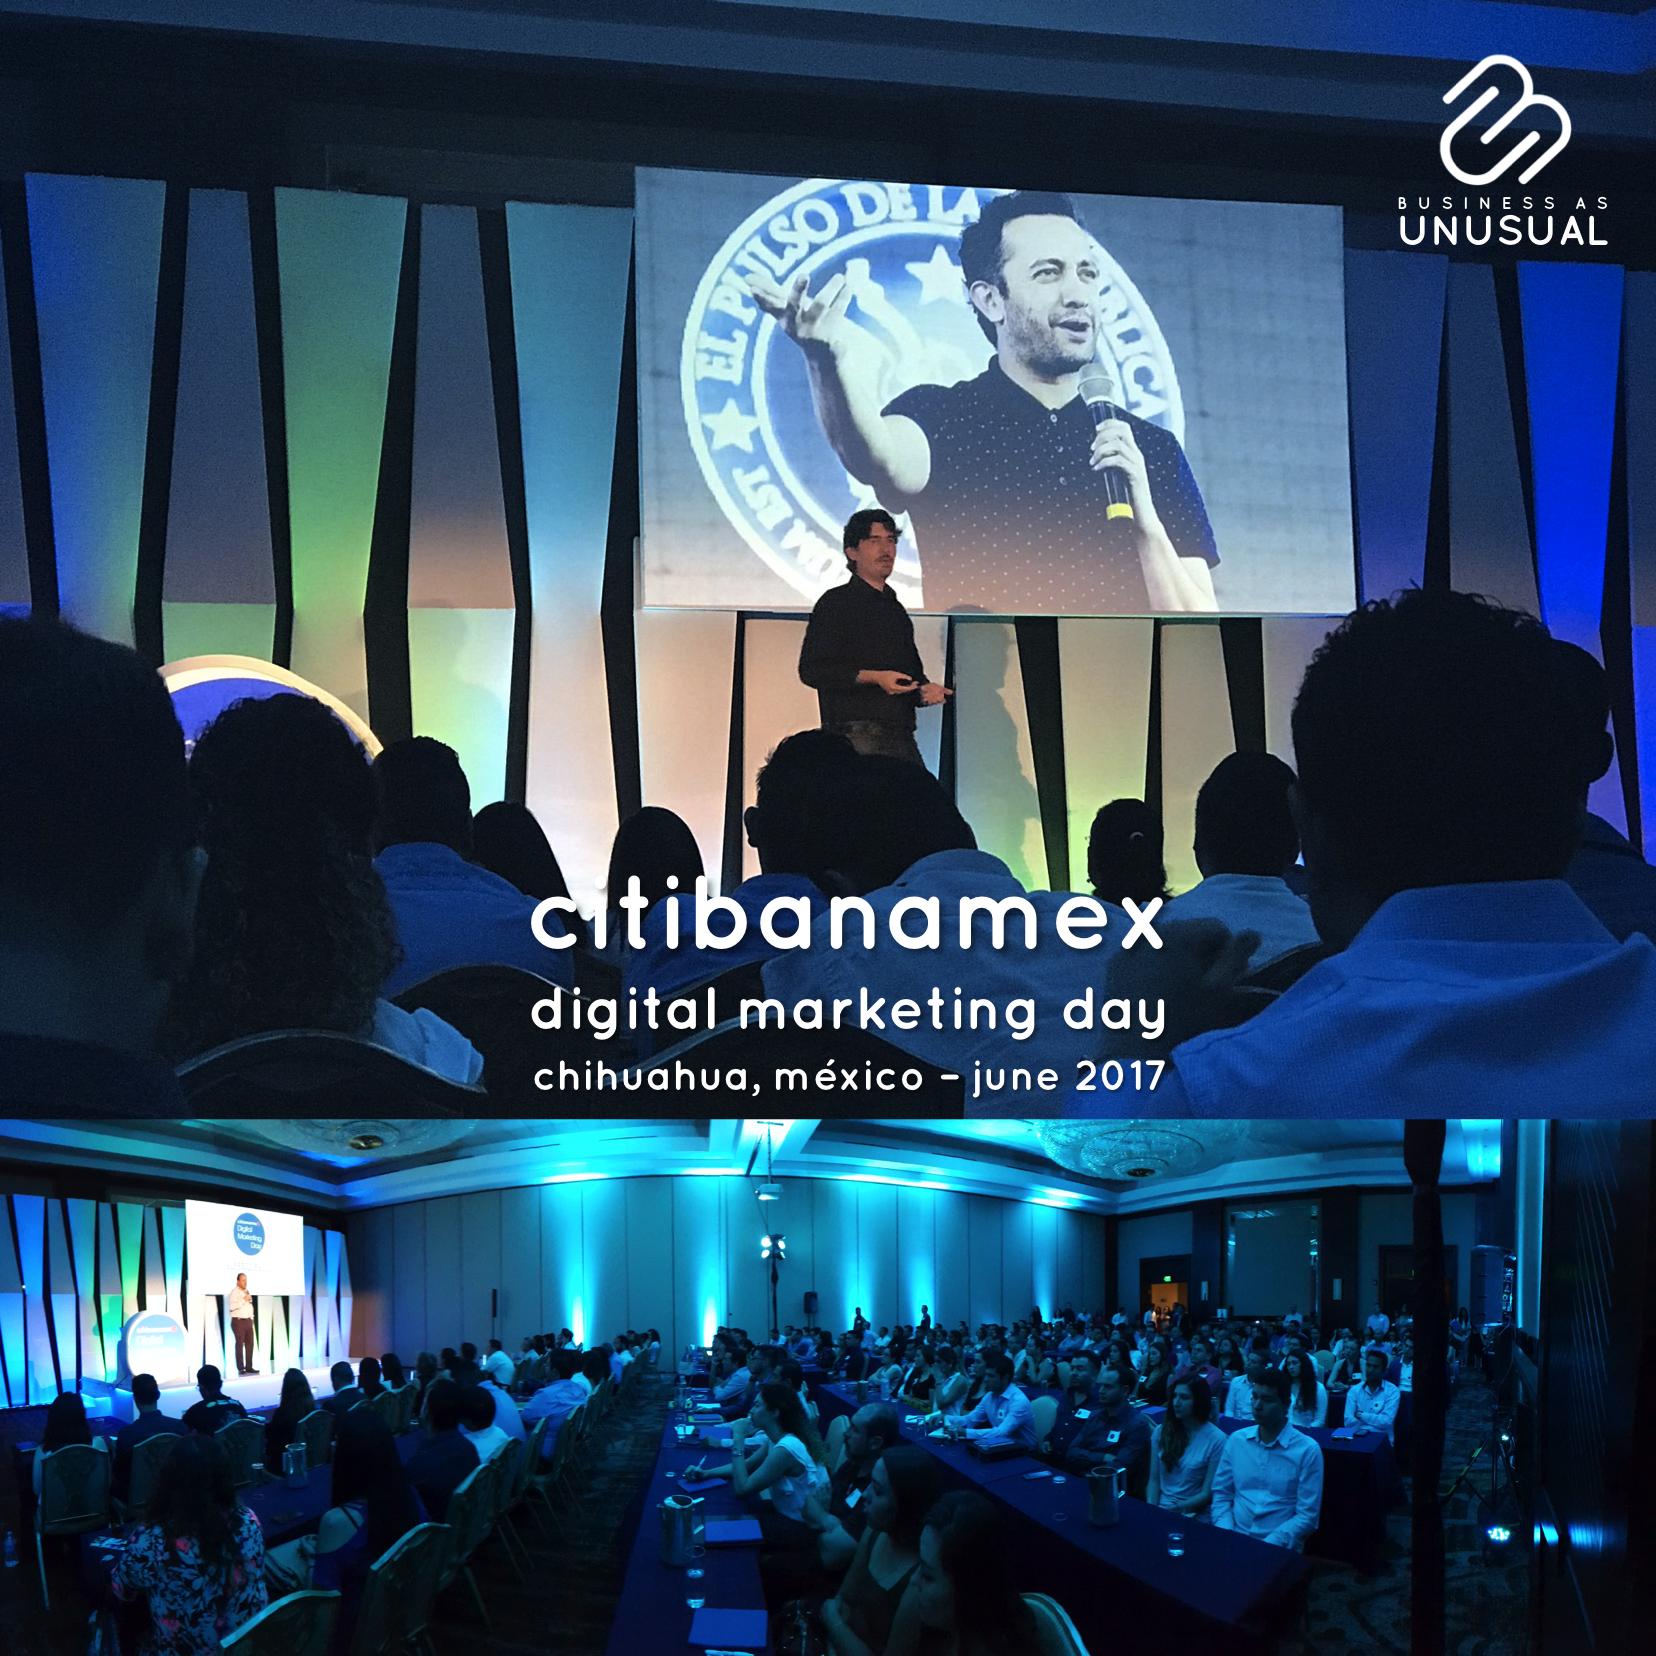 Citibanamex - Digital Marketing Day - Chihuahua